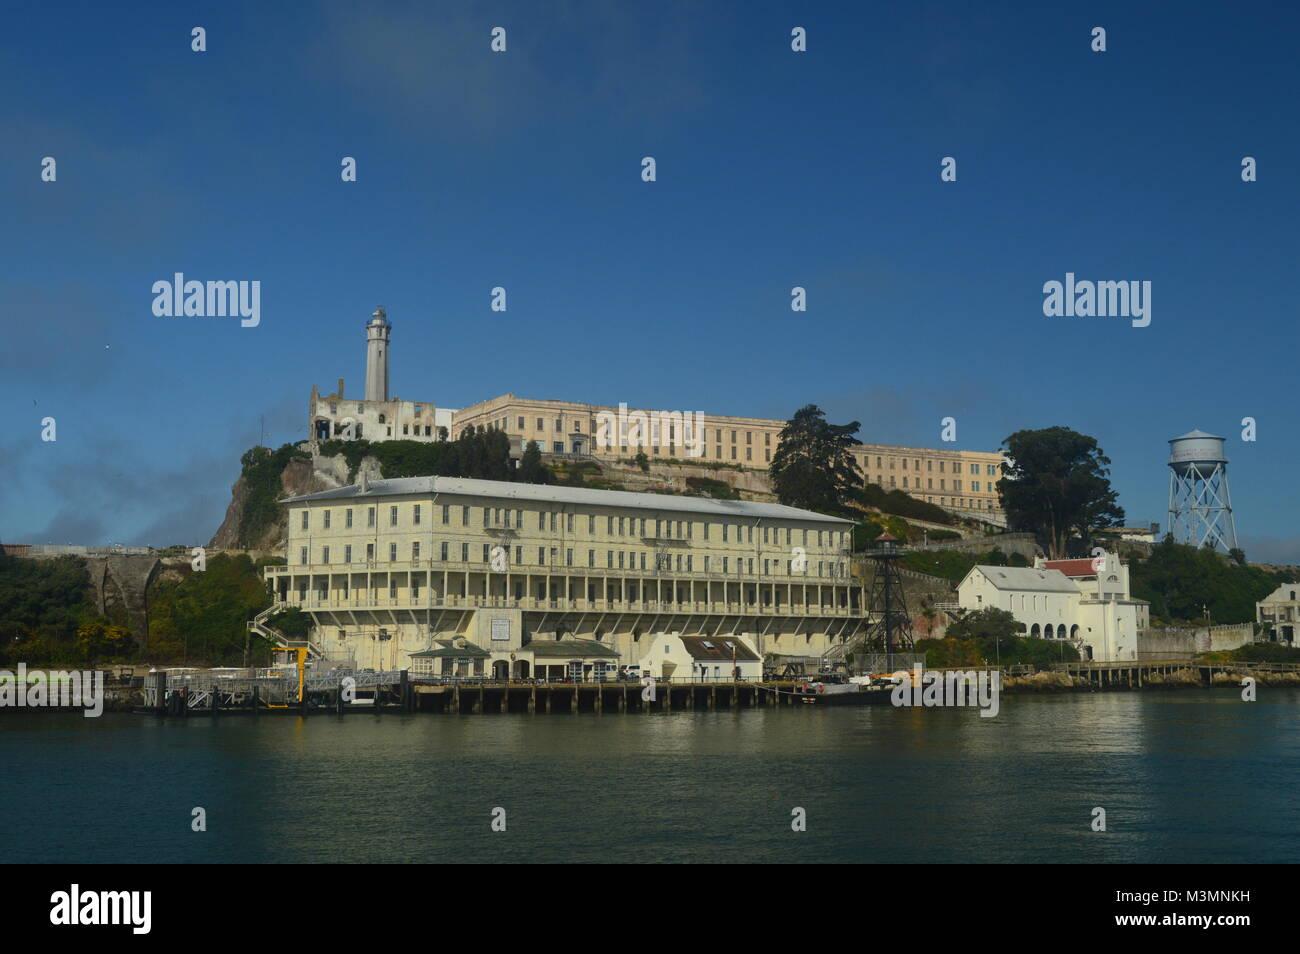 Views Of Alcatraz Island From The Sea. Travel Holidays Architecture June 30, 2017. San Francisco. California USA EEUU Stock Photo